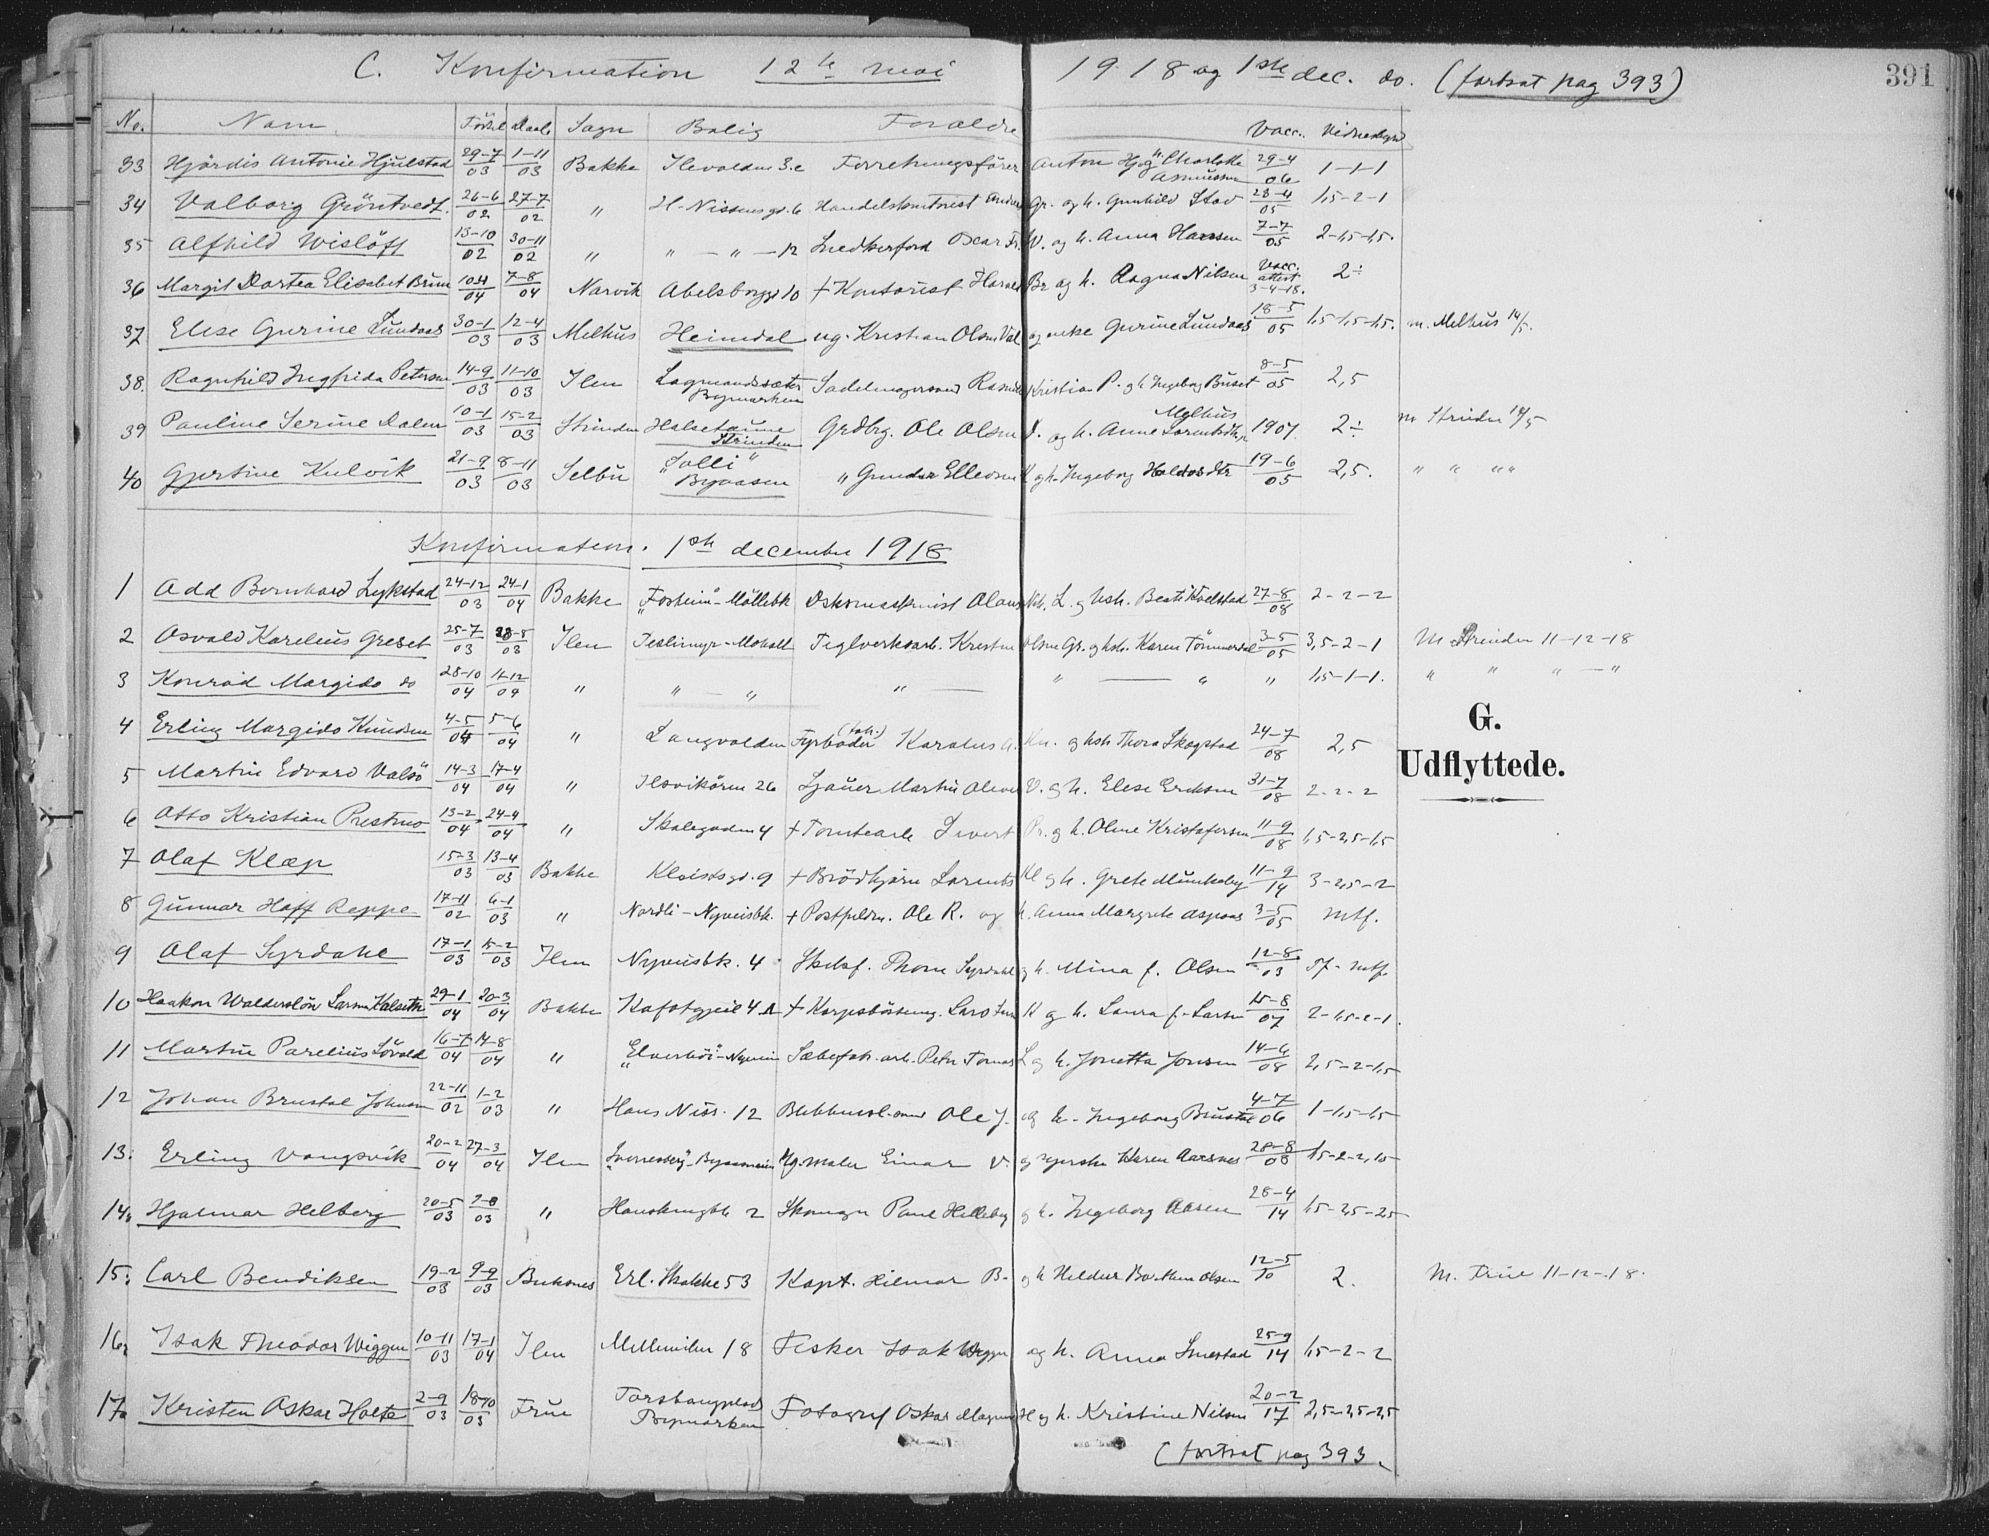 SAT, Ministerialprotokoller, klokkerbøker og fødselsregistre - Sør-Trøndelag, 603/L0167: Parish register (official) no. 603A06, 1896-1932, p. 391